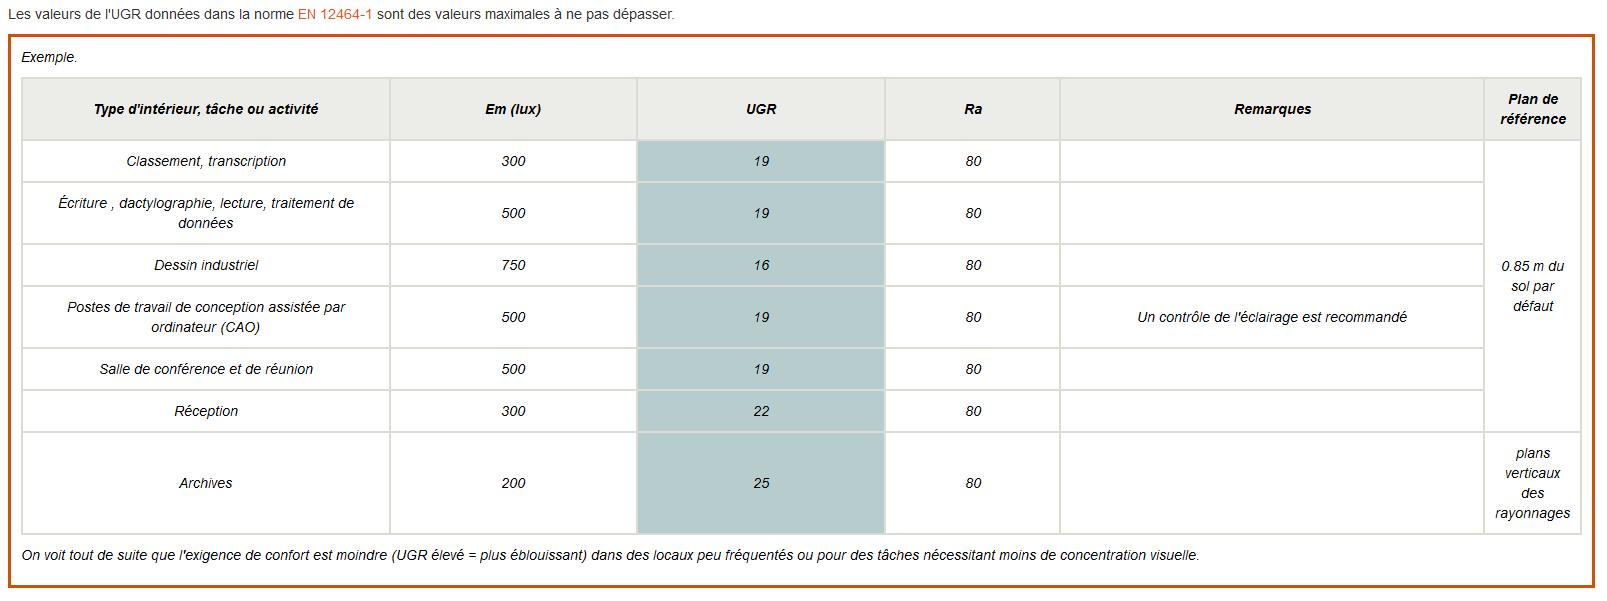 Tableau exemples UGR pour installation dalle60x60